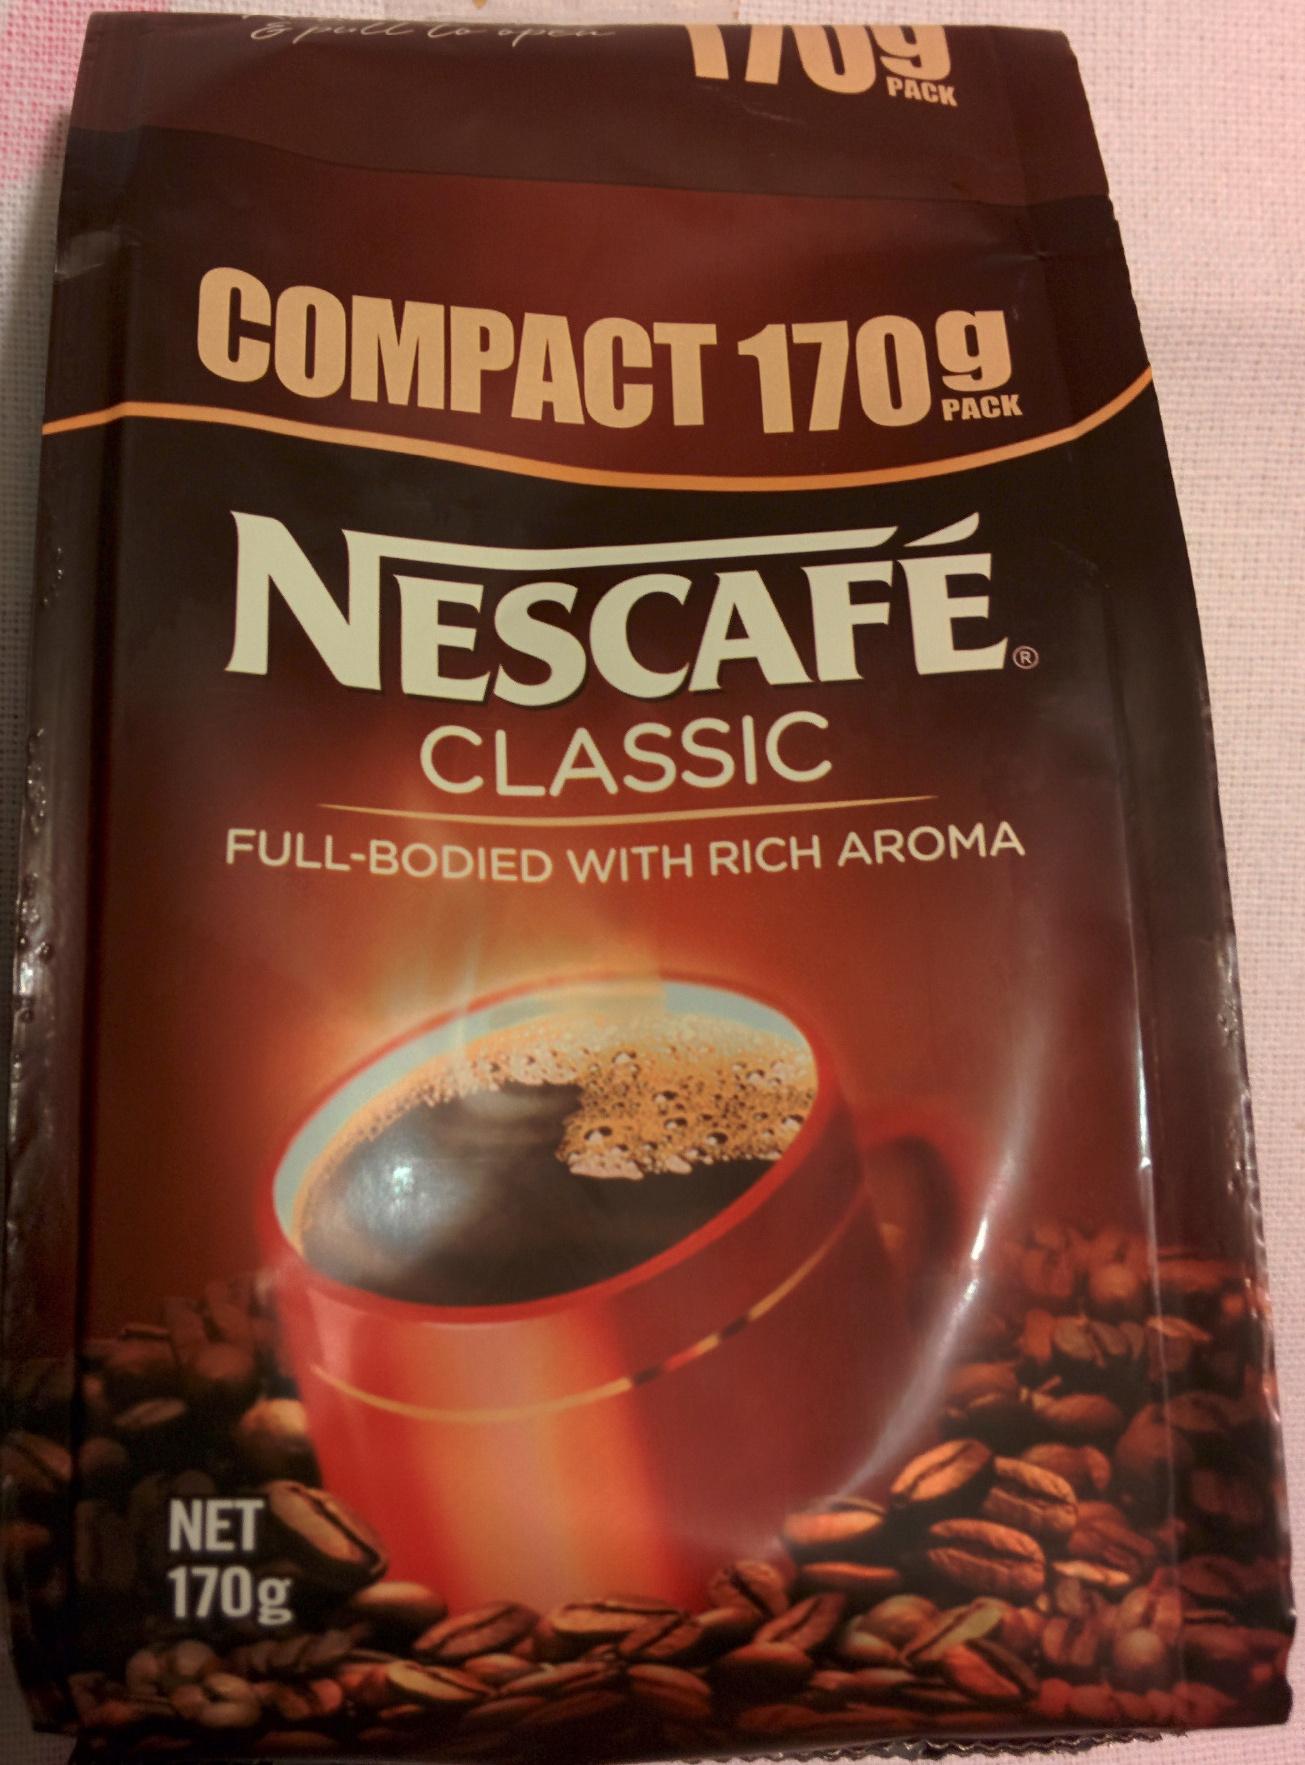 Nescafe classic ingredients